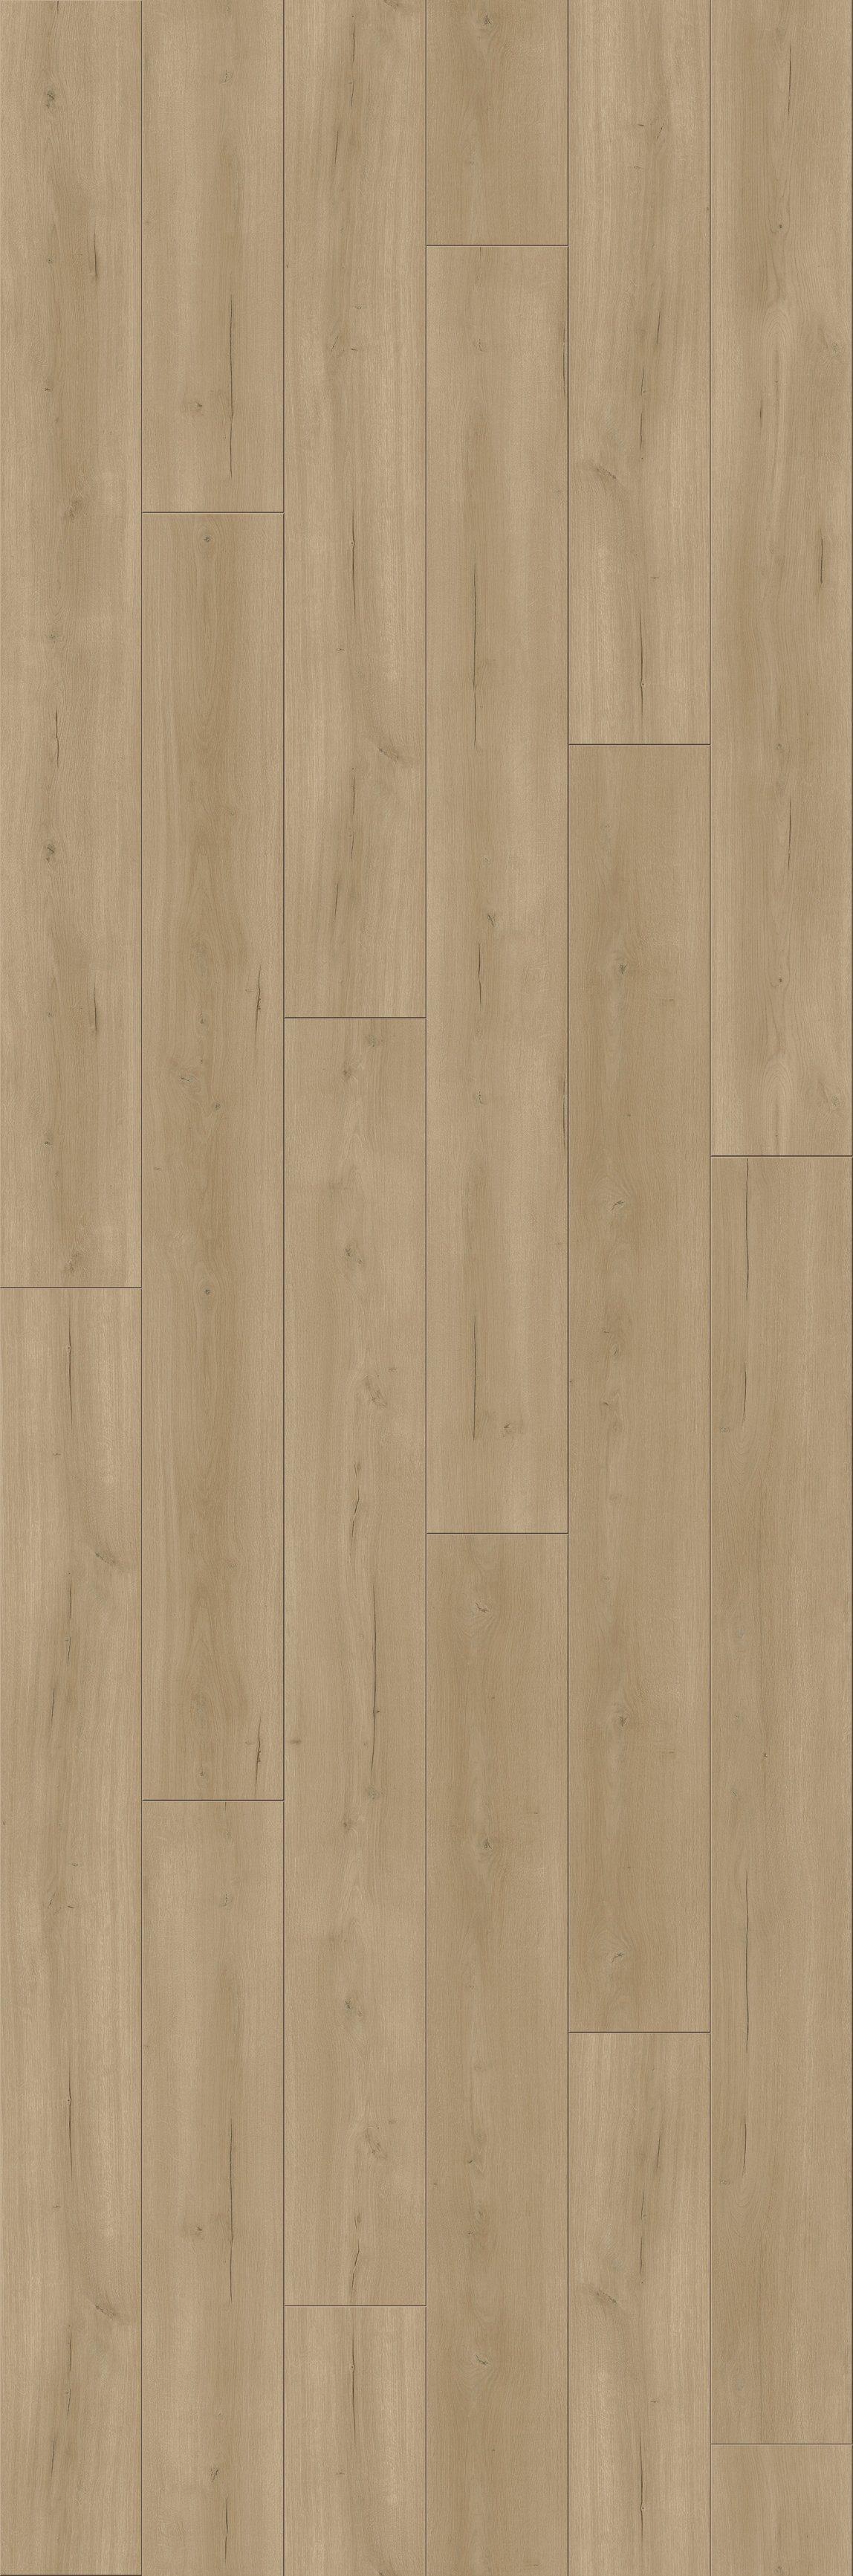 PARADOR Laminat »Trendtime 6 - Eiche Loft Natur«, 2200 x 243 mm, Stärke: 9 mm